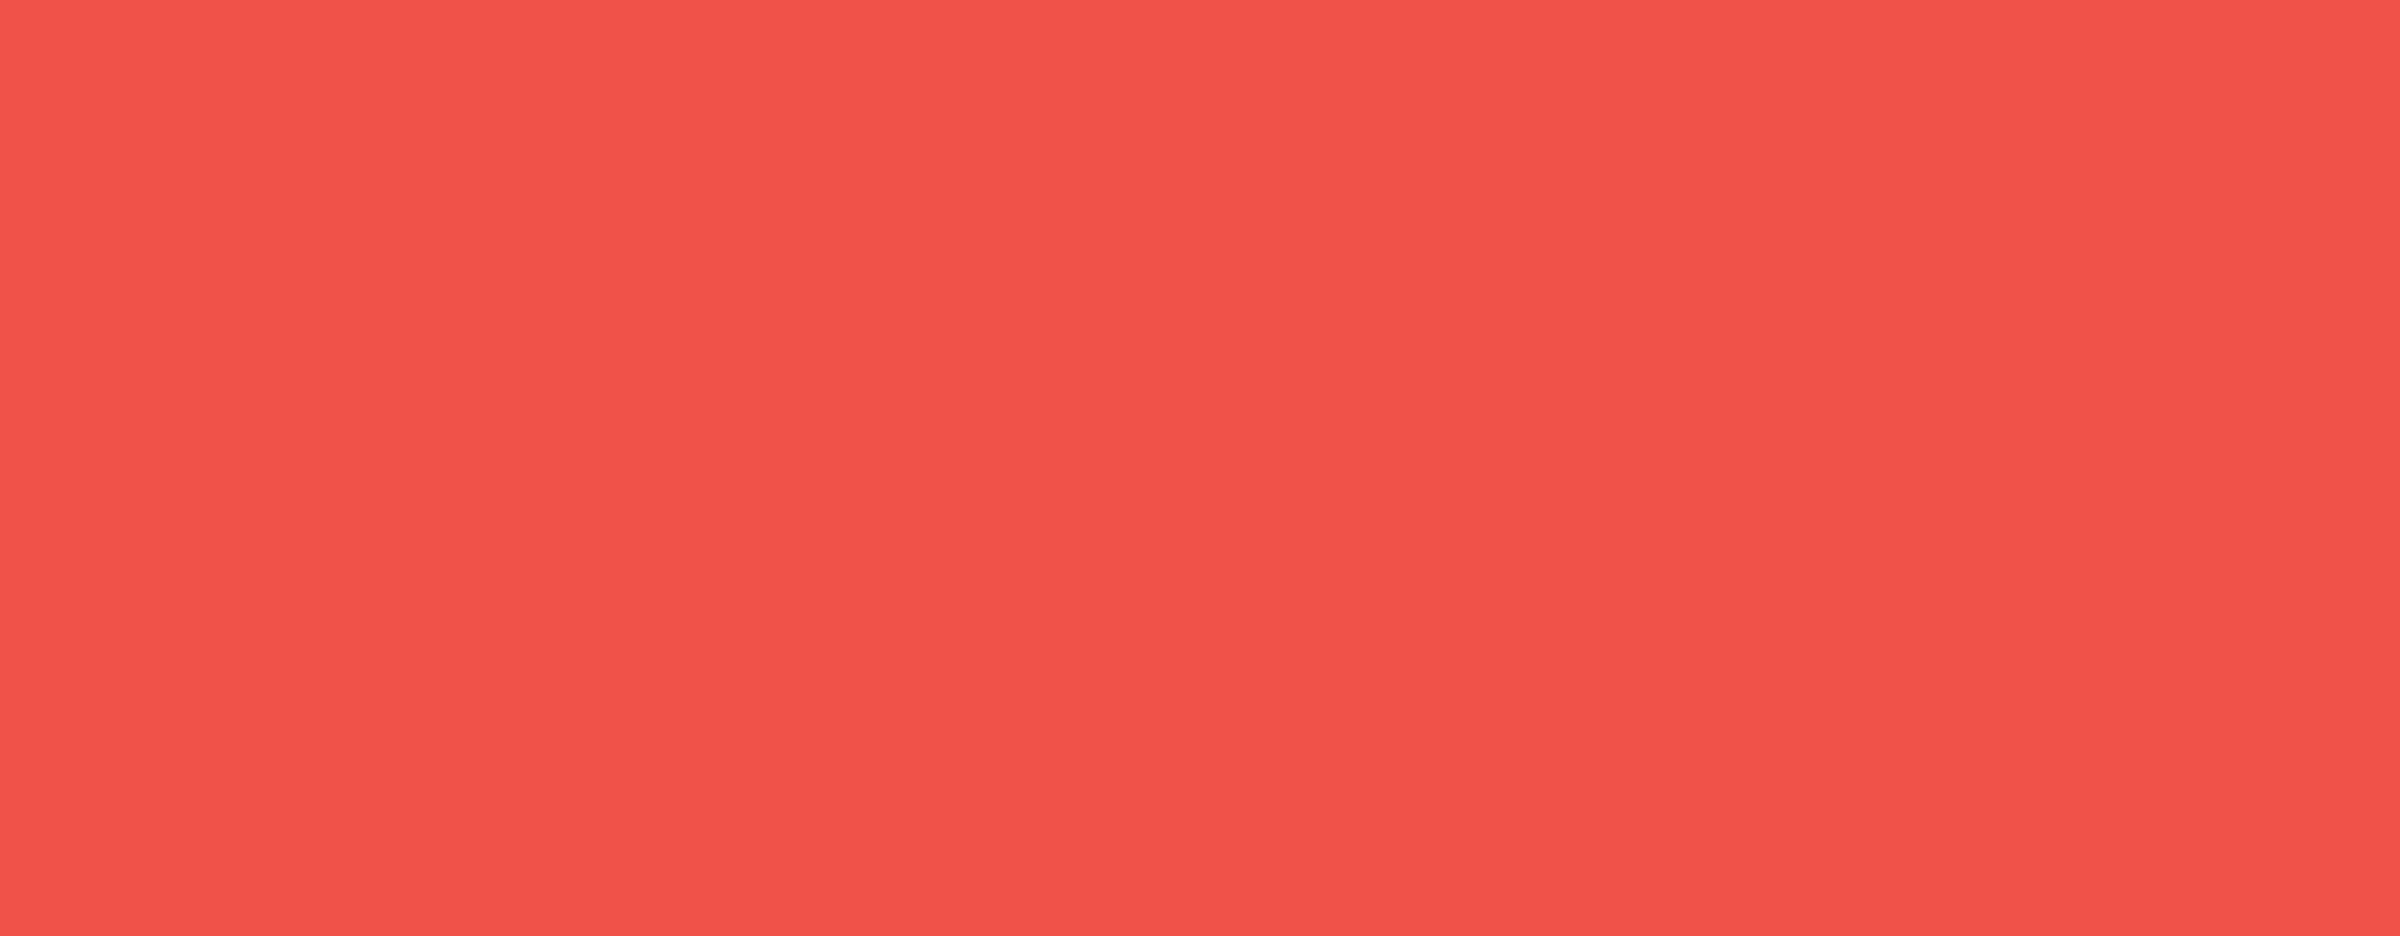 On Anfield Road Lyrics Tumblr Static Red